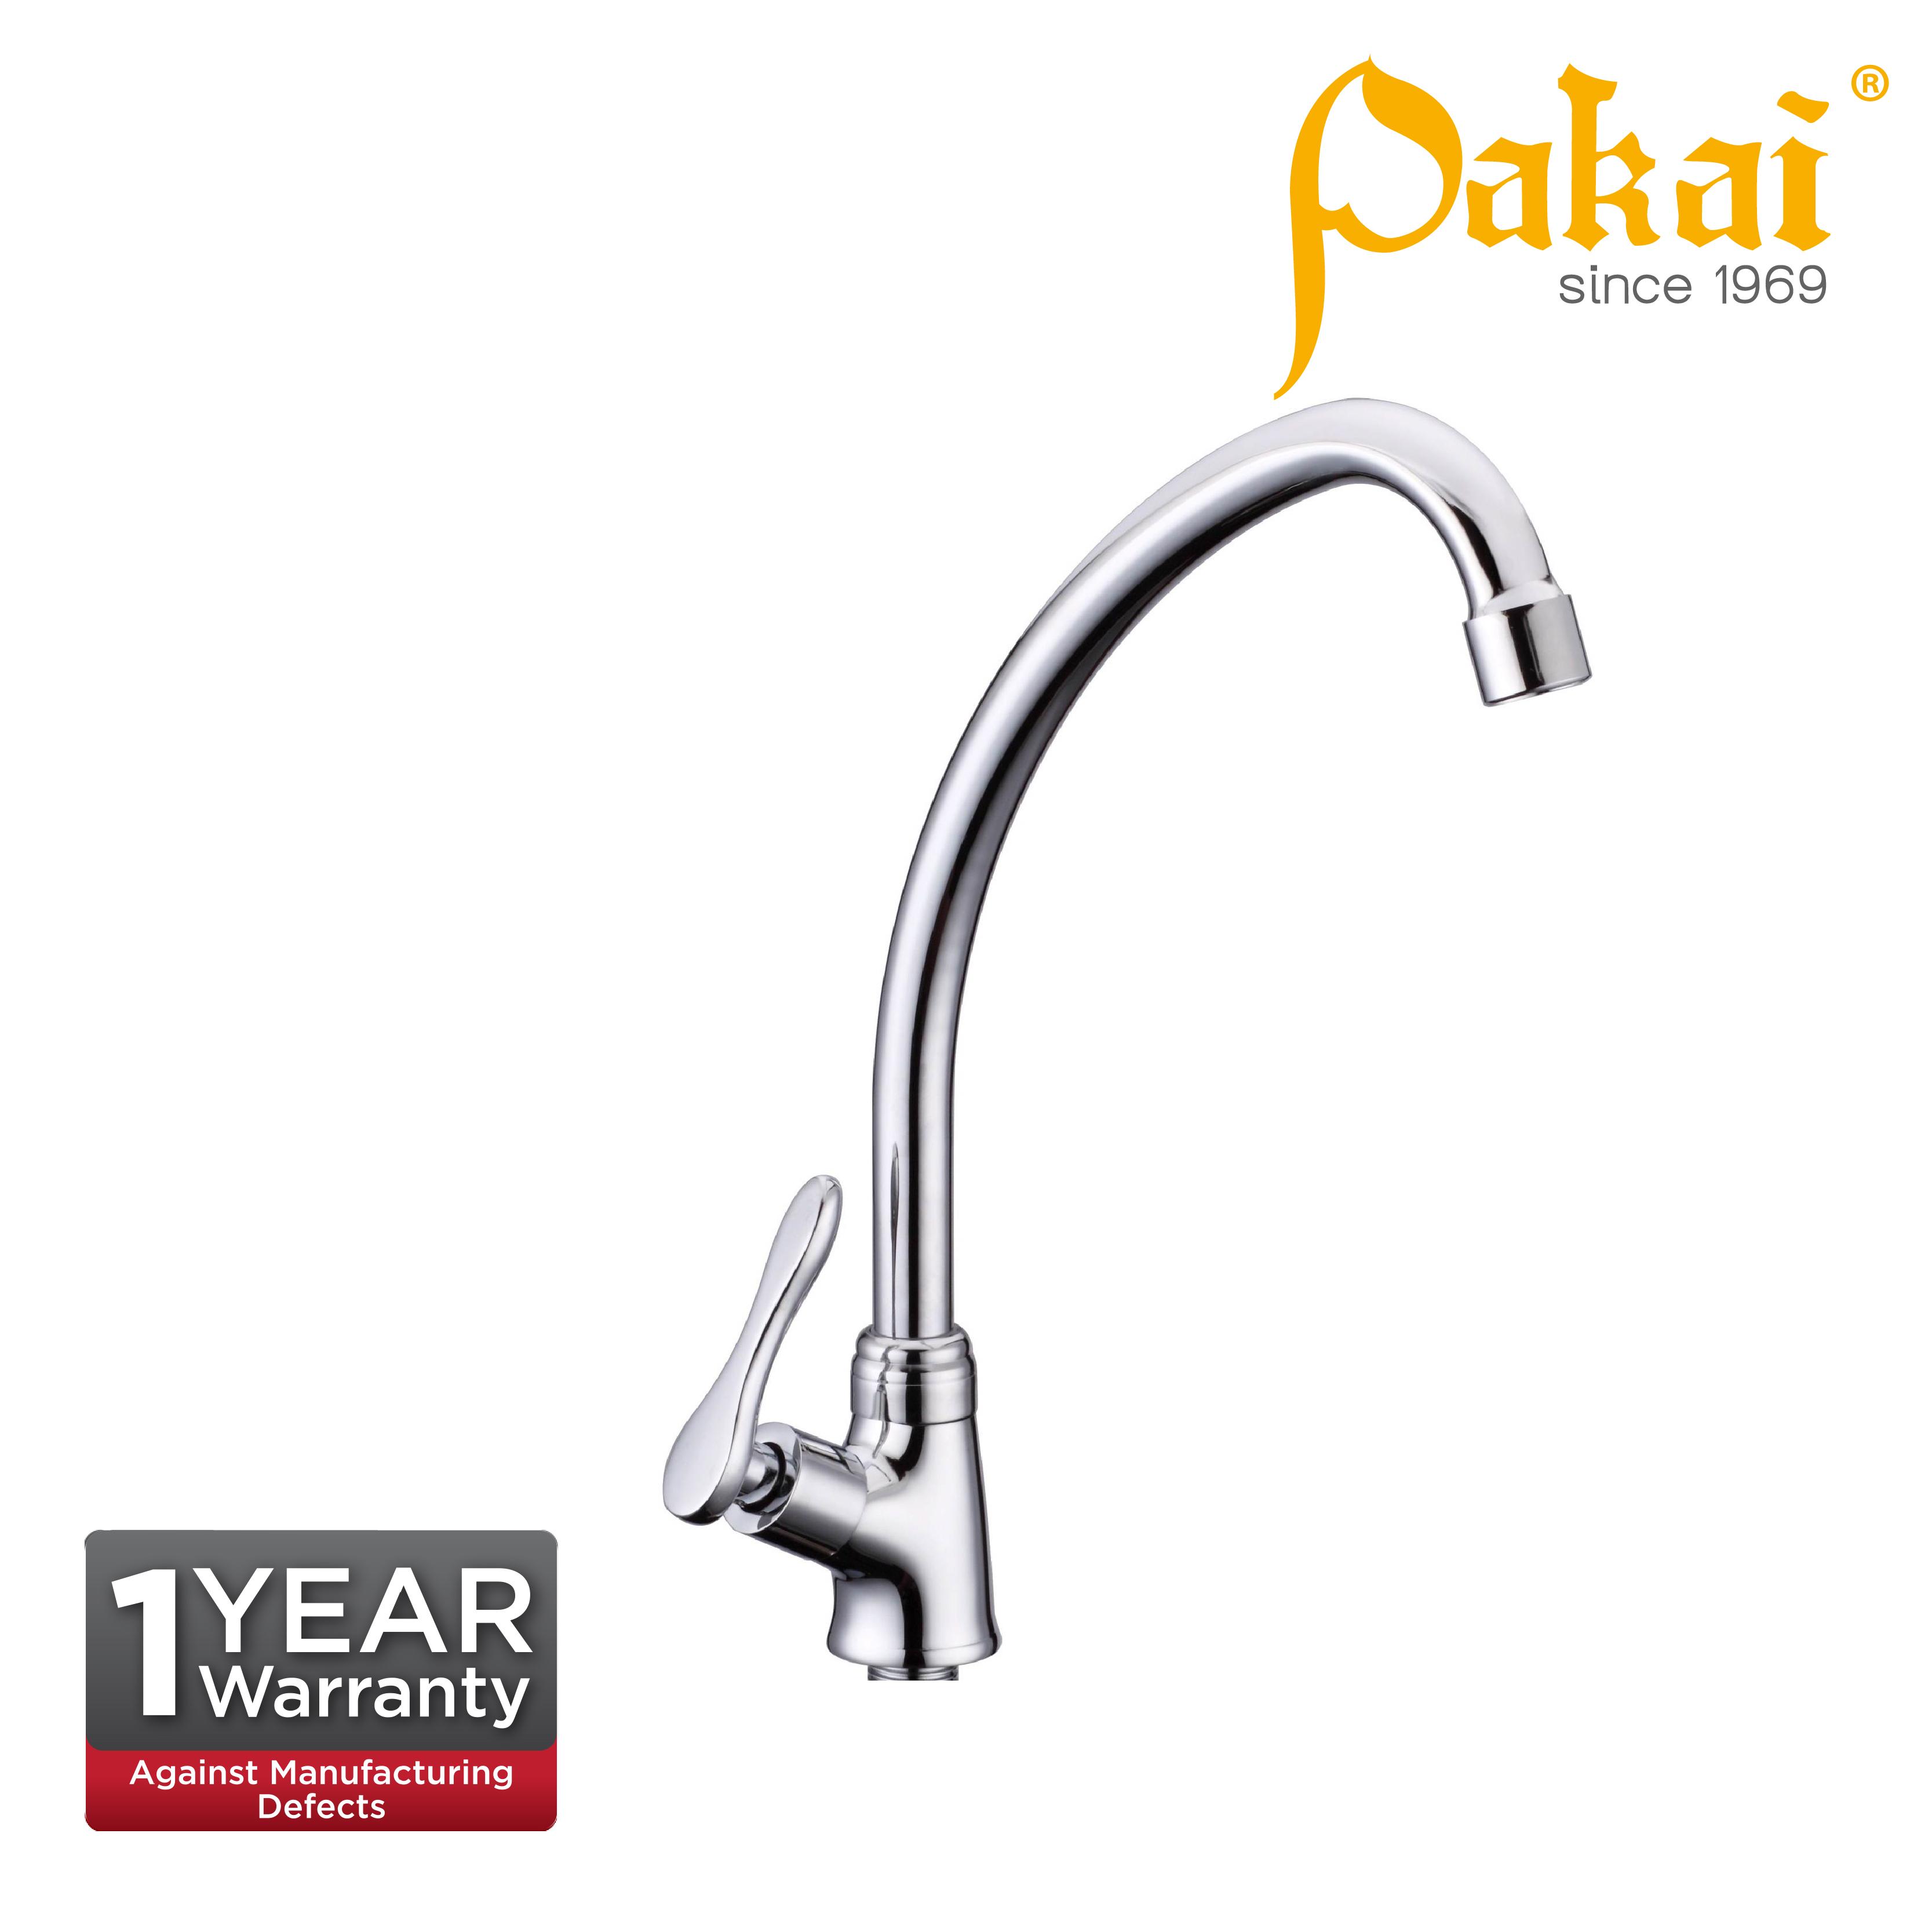 Pakai Pillar Ear Spout Sink Tap Curve Series CV52000ES